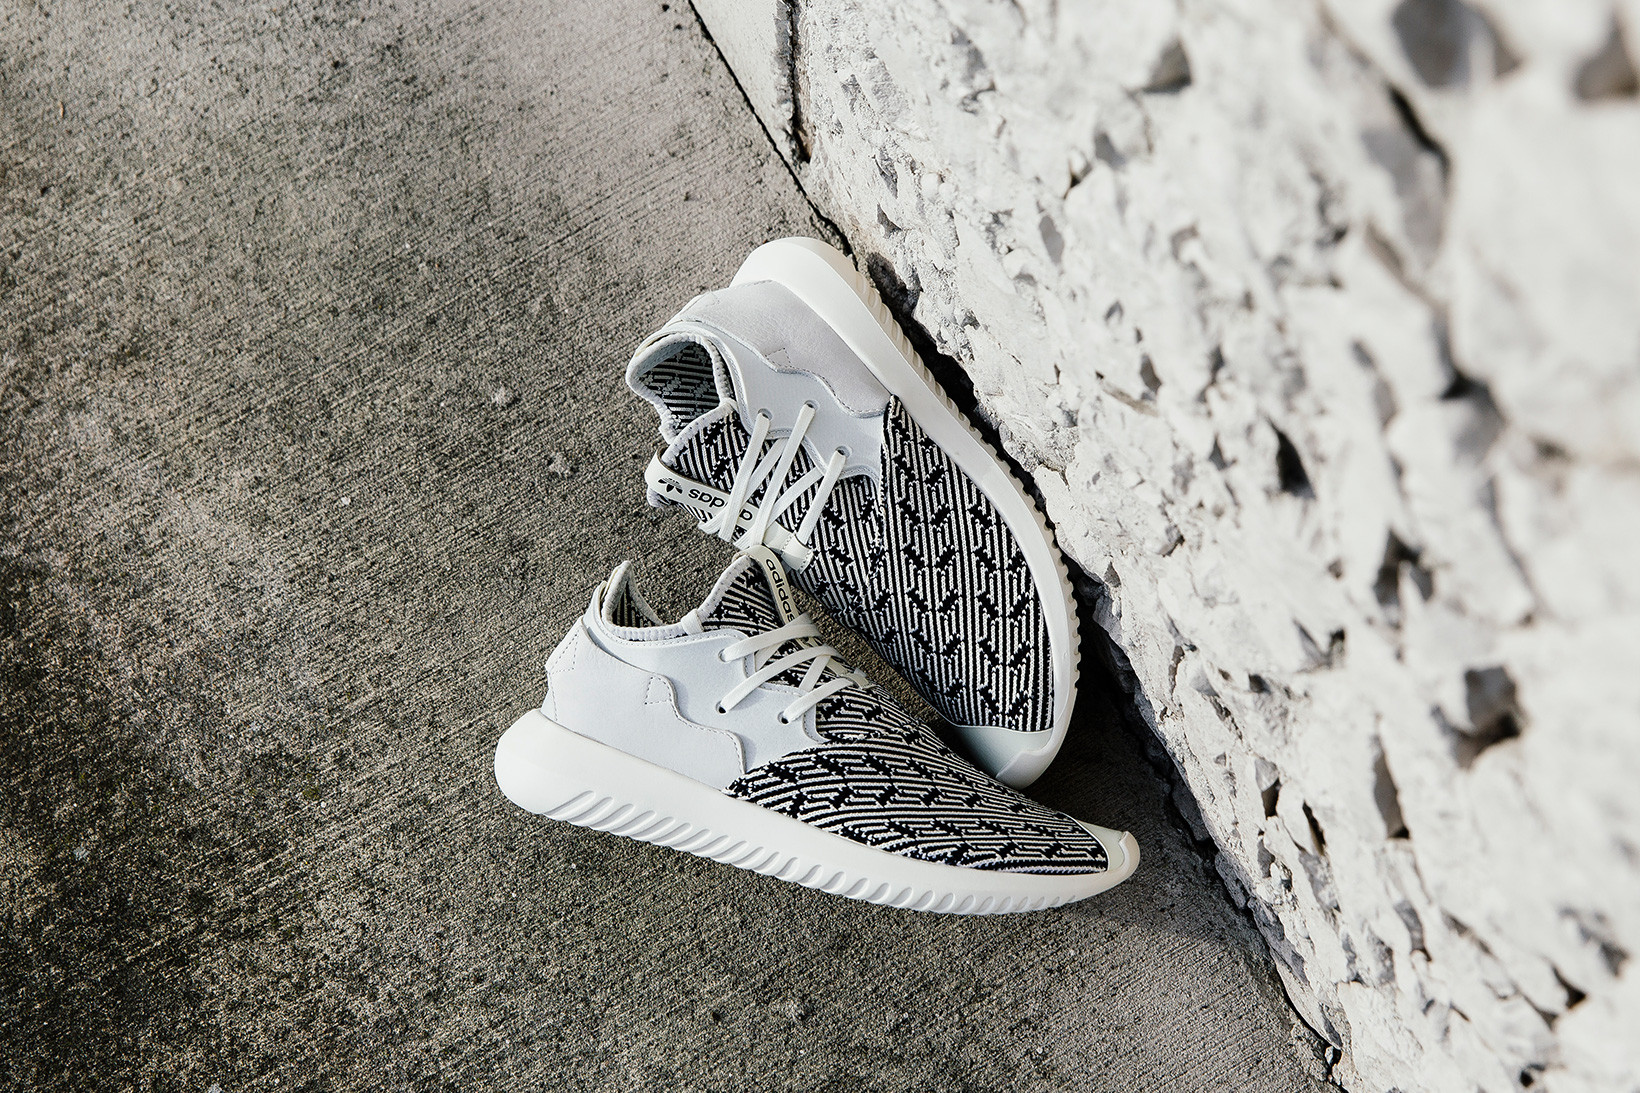 adidas Tubular Entrap Primeknit and Off-White